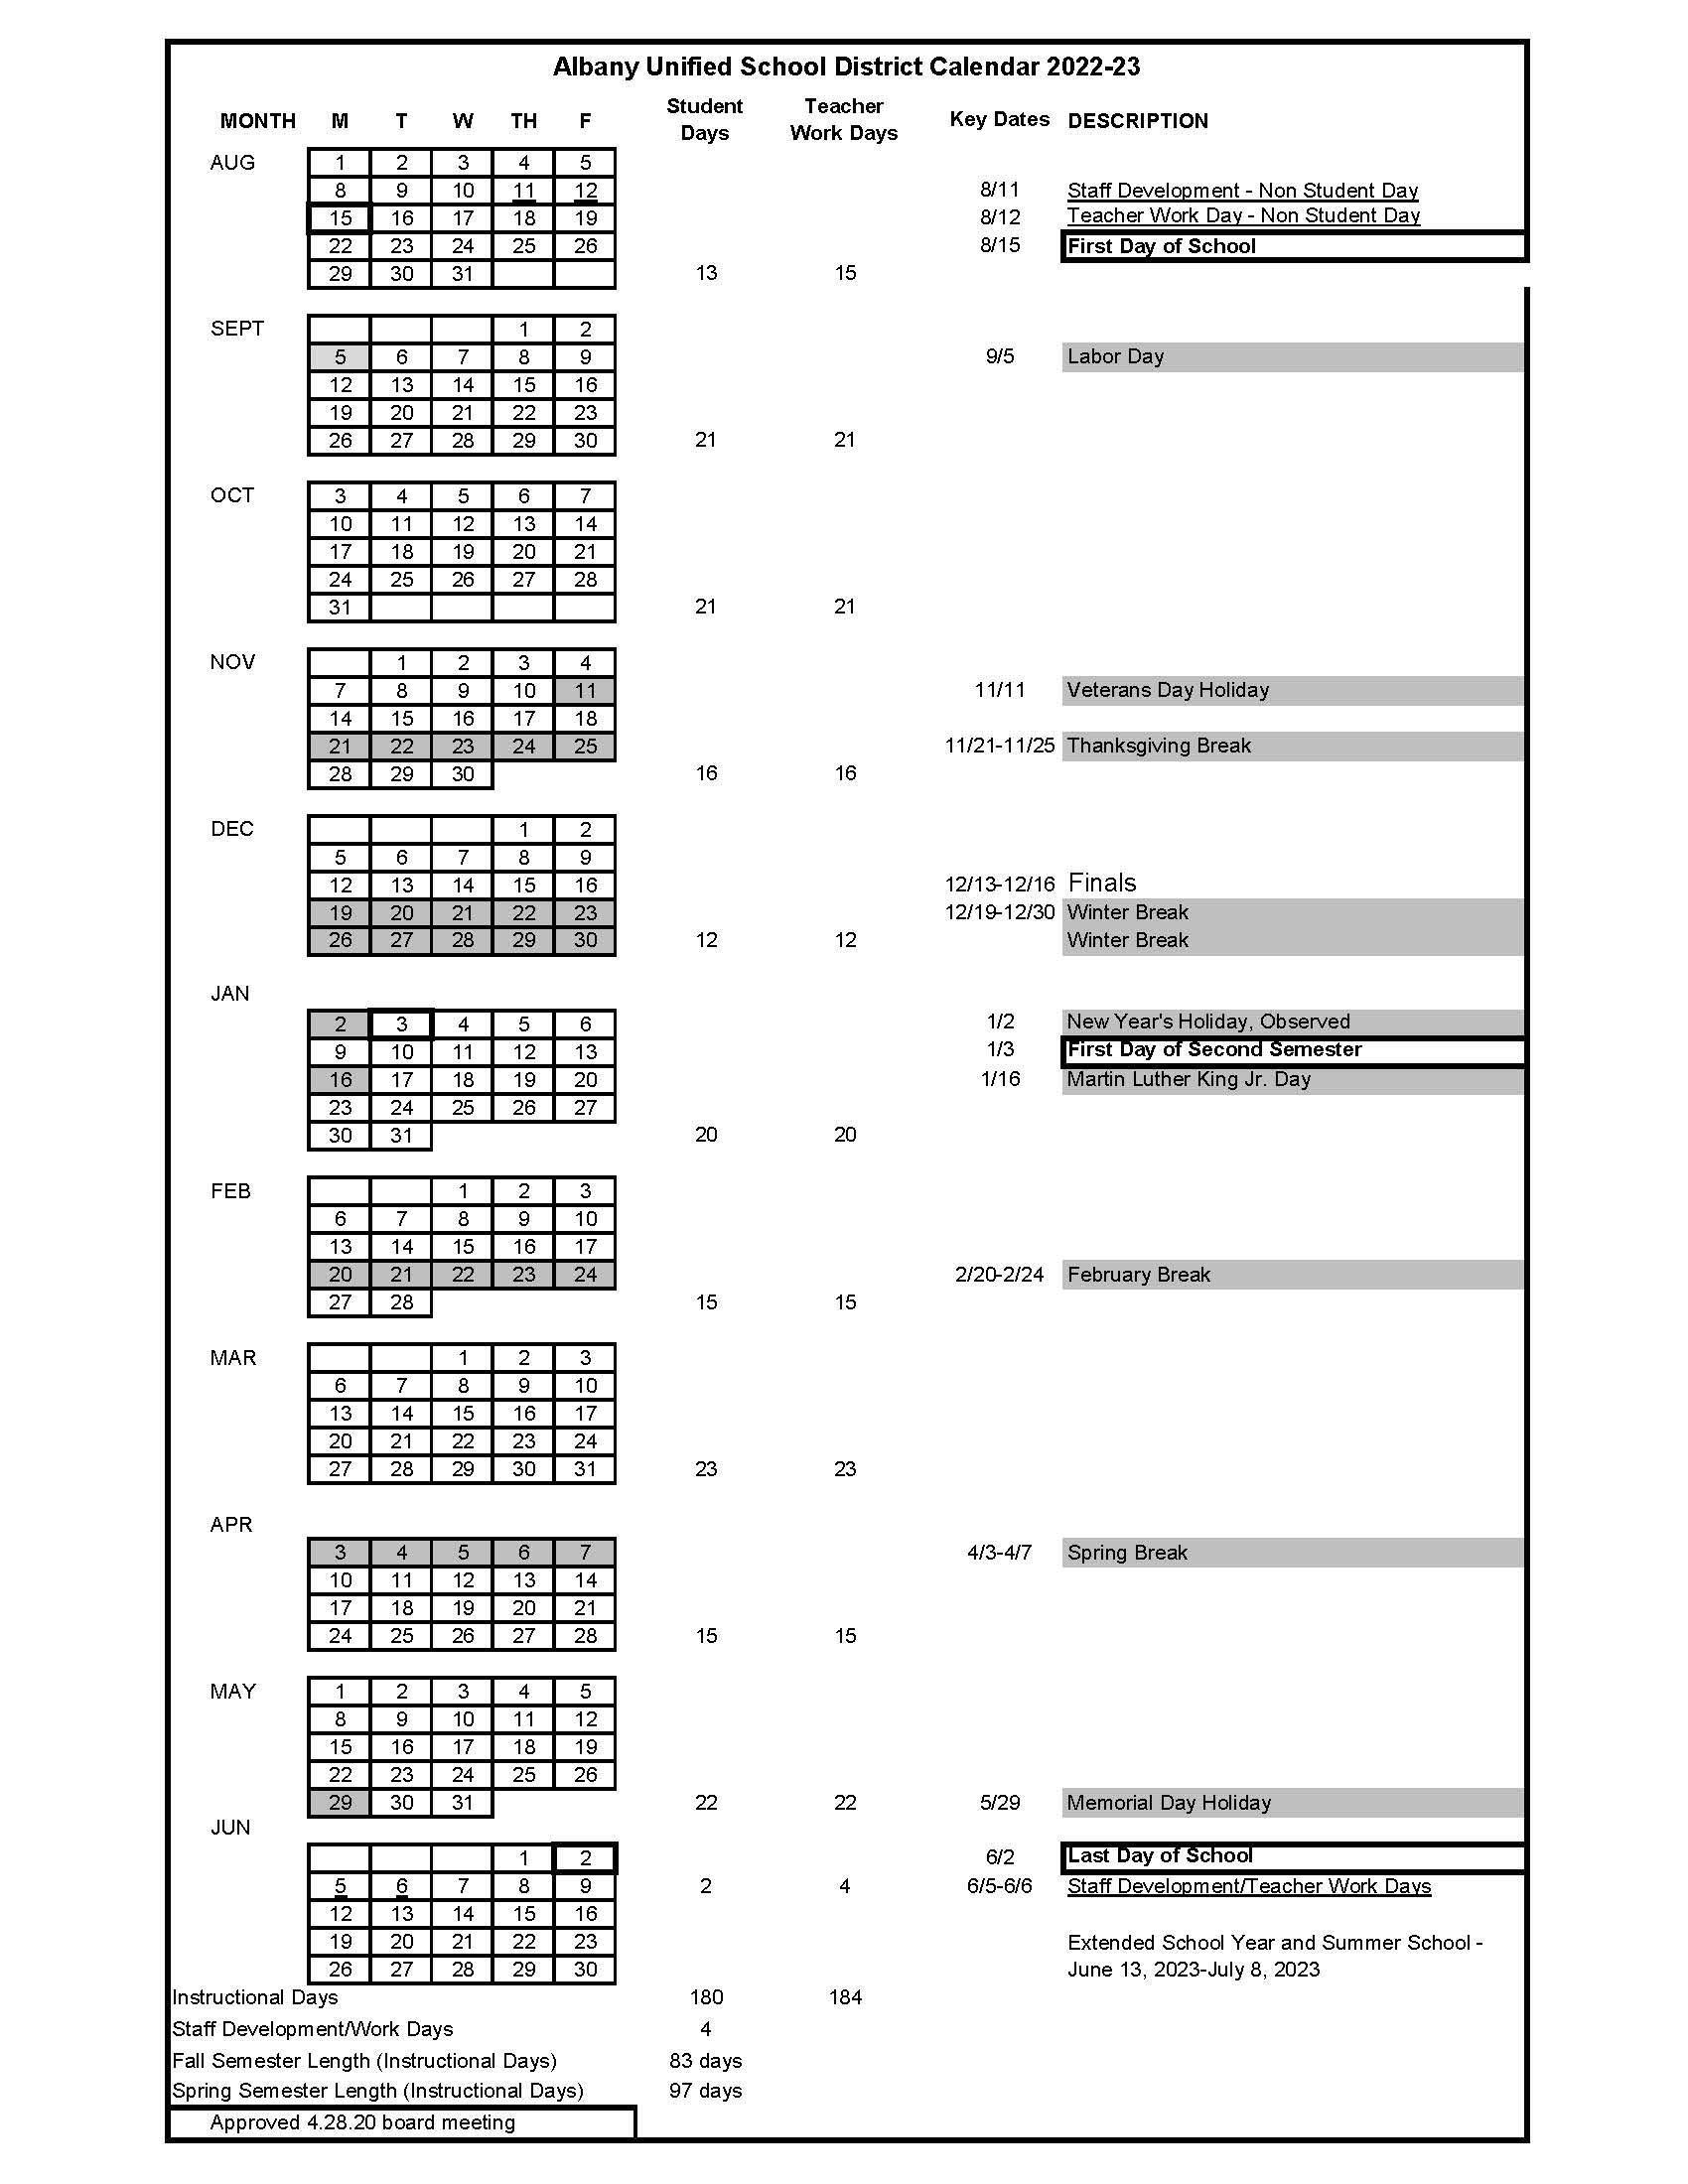 Cornell 2022 23 Calendar.2022 2023 School Year Calendar Academic School Year Calendars Albany Unified School District